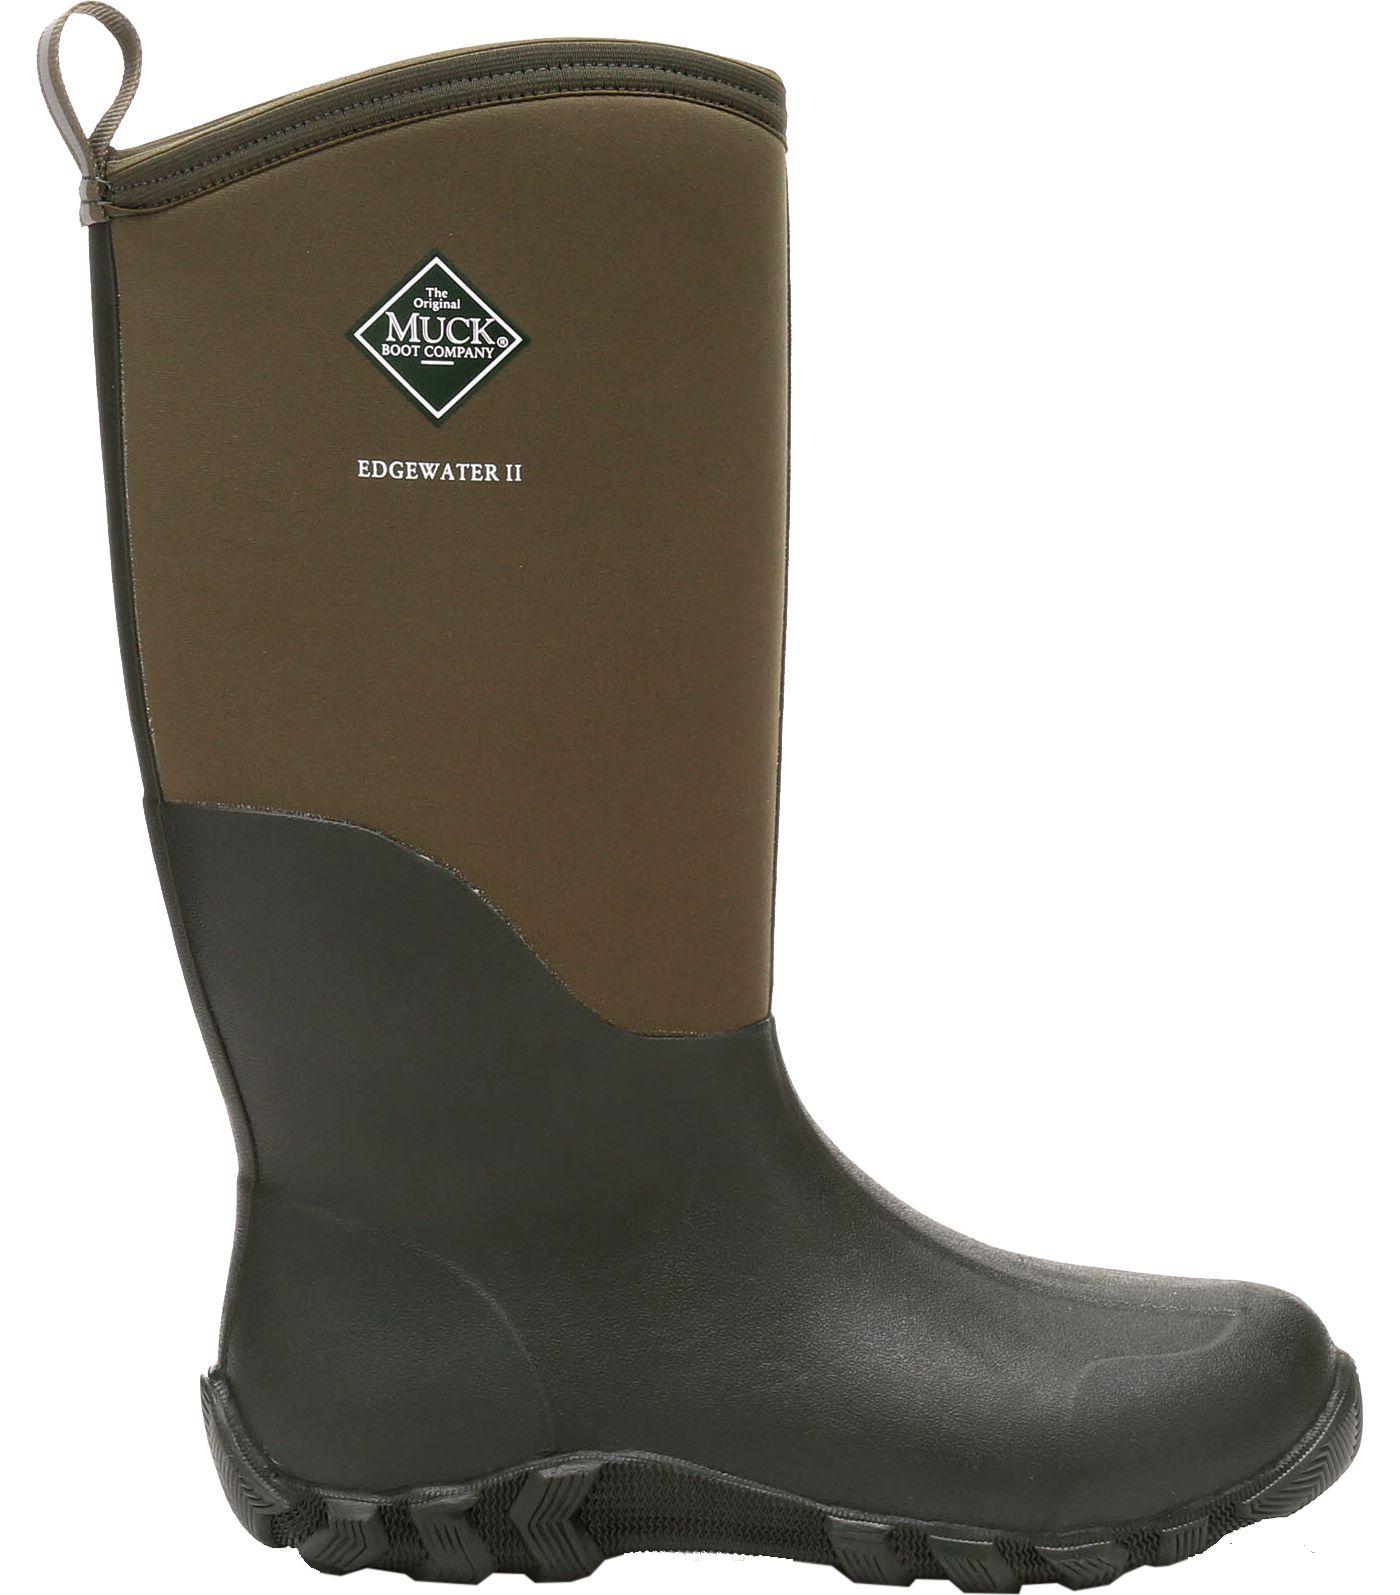 Muck Boots Men's Edgewater II Tall Rubber Boots